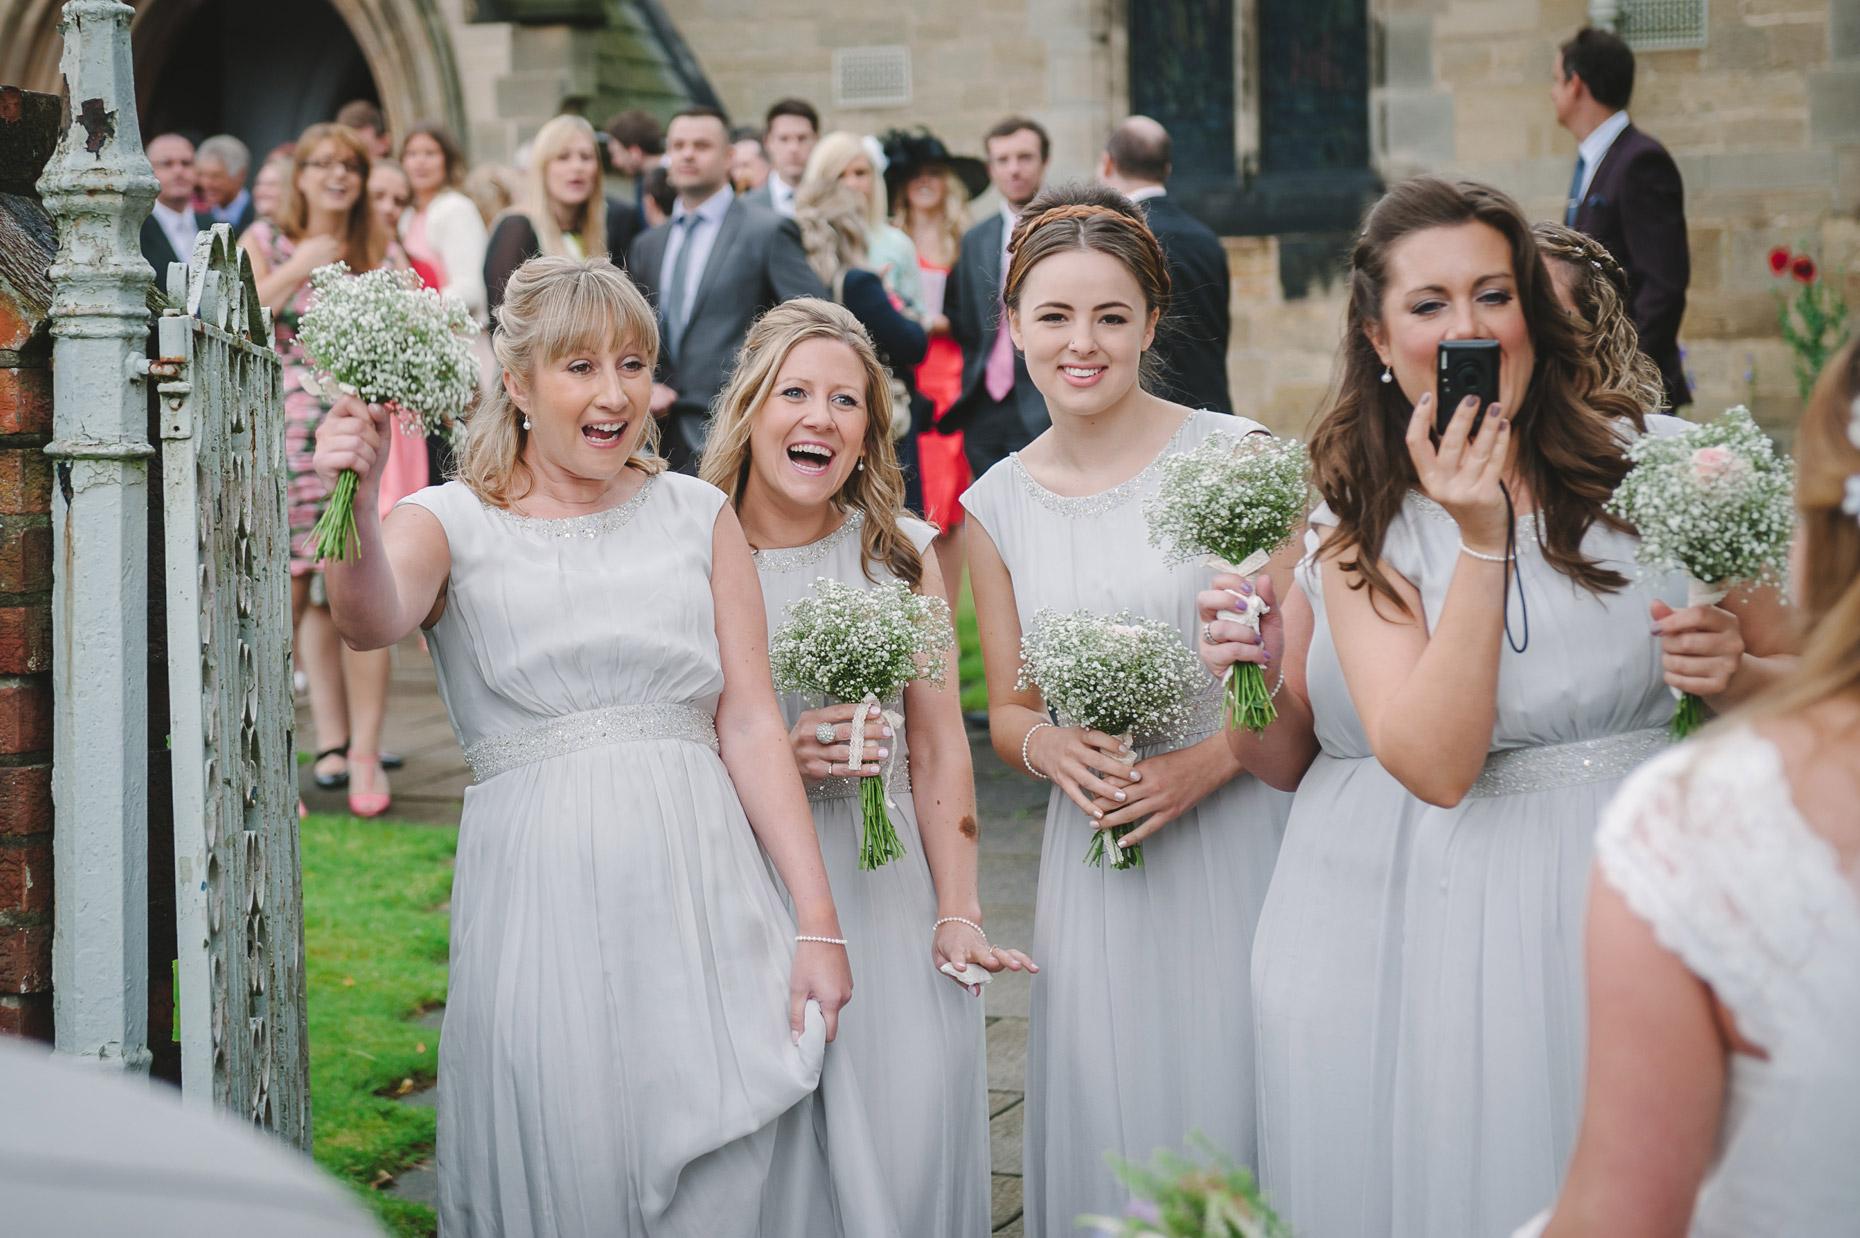 barmbyfield_barn_wedding_photos065.jpg